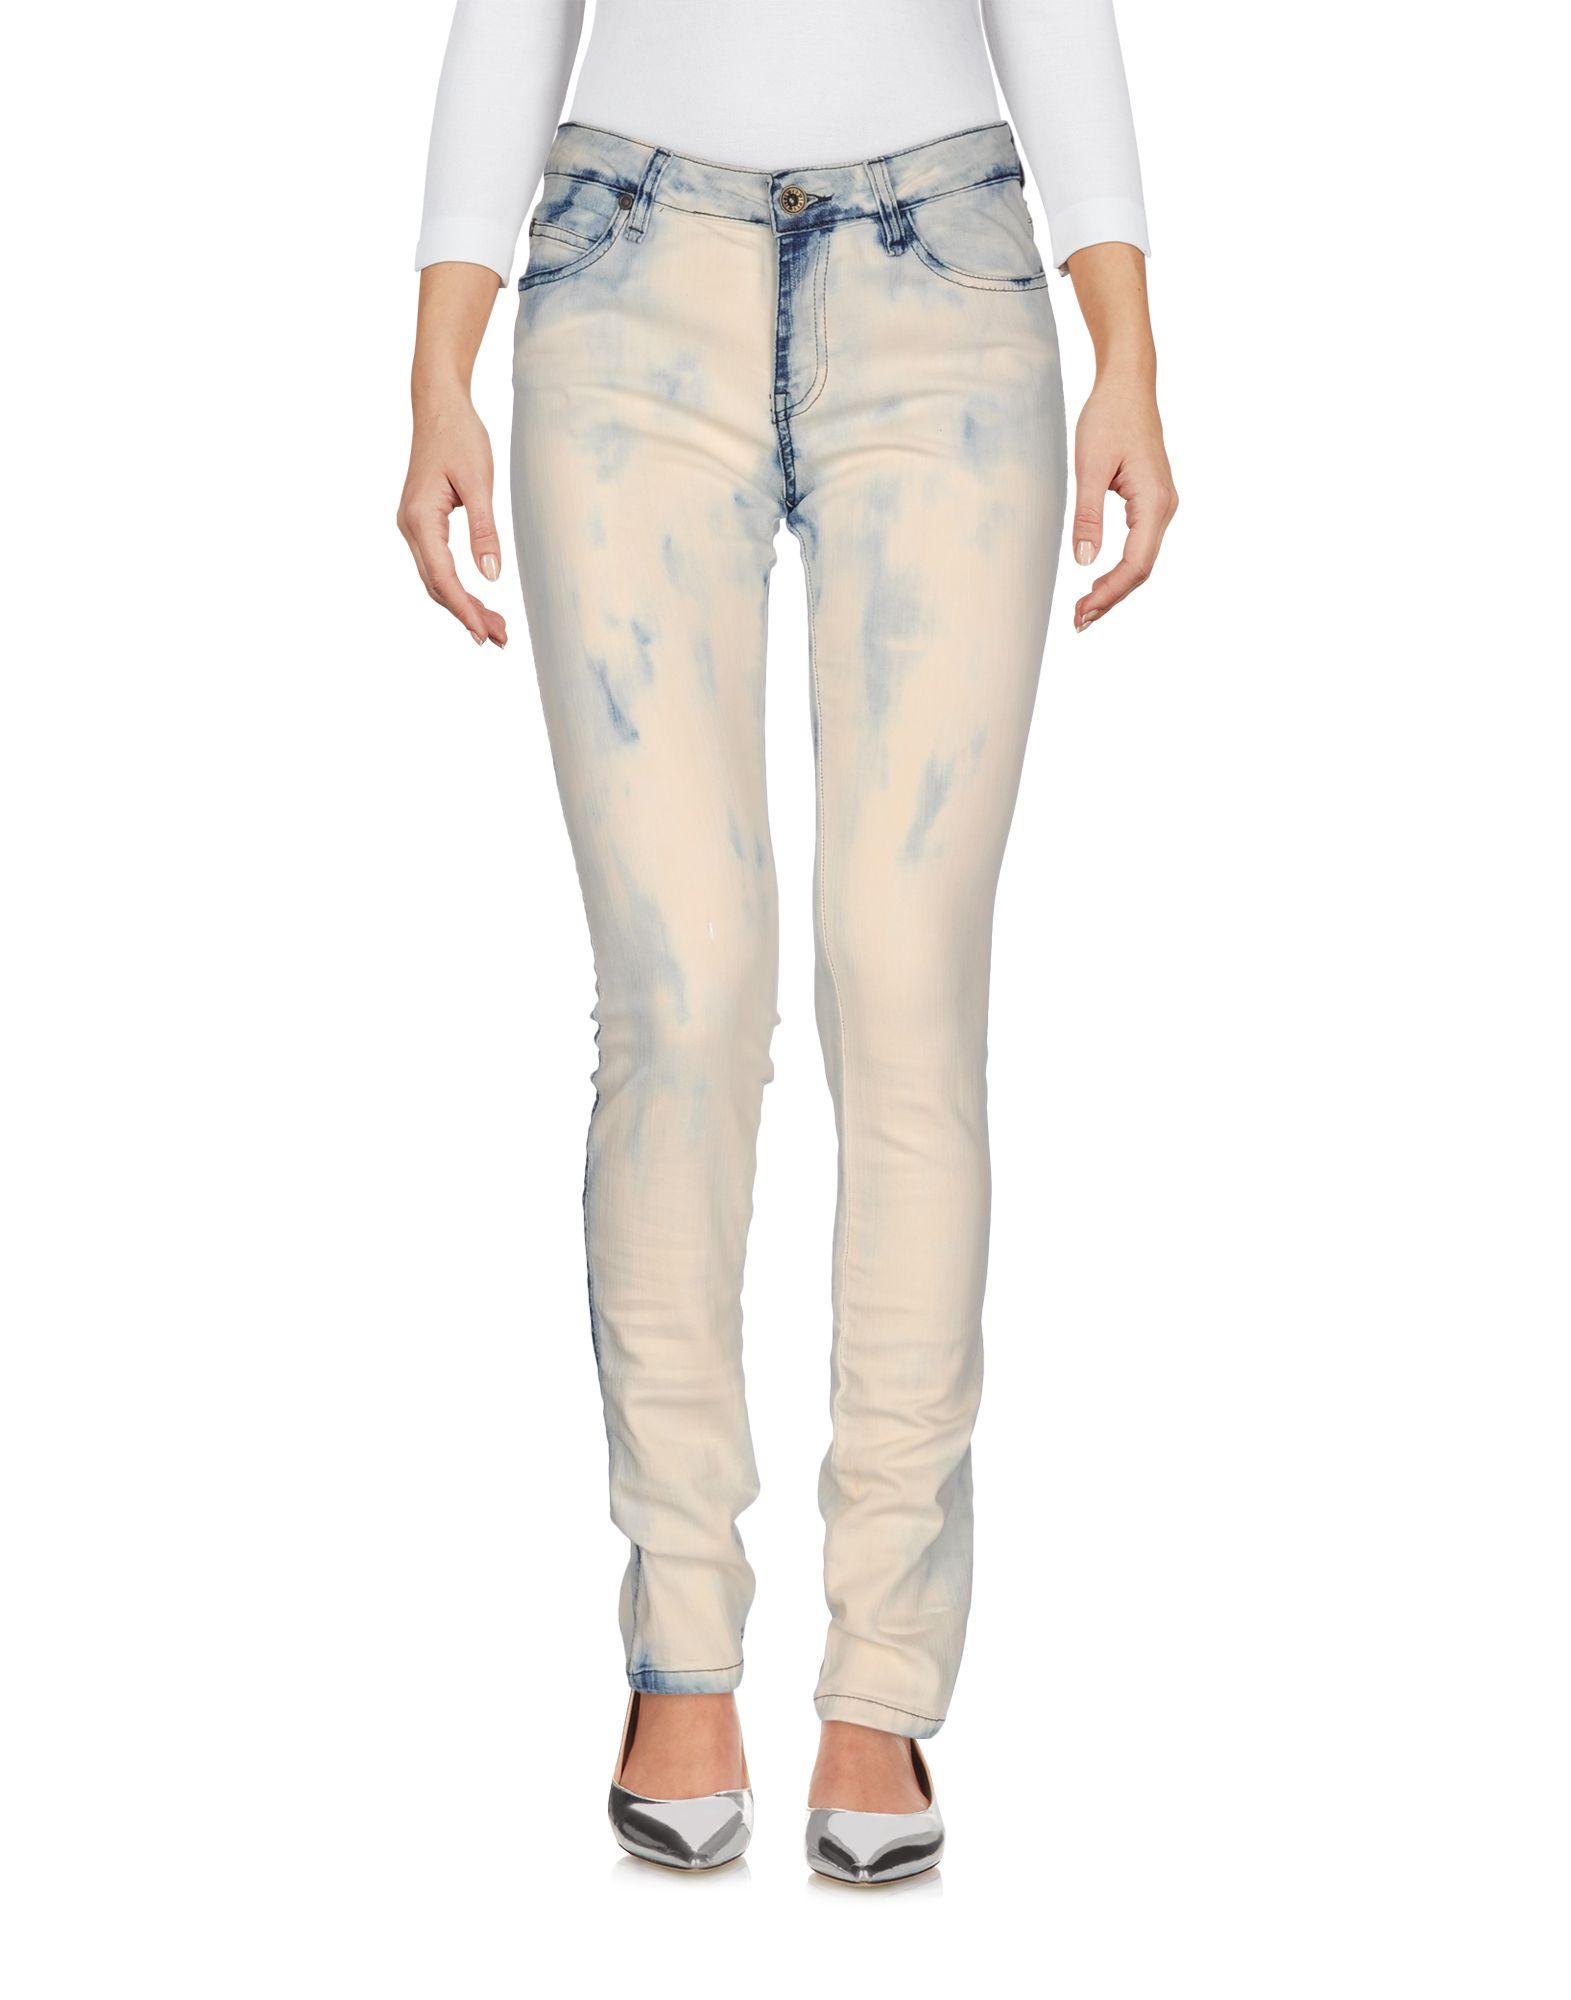 PLEIN SUD JEANS Джинсовые брюки